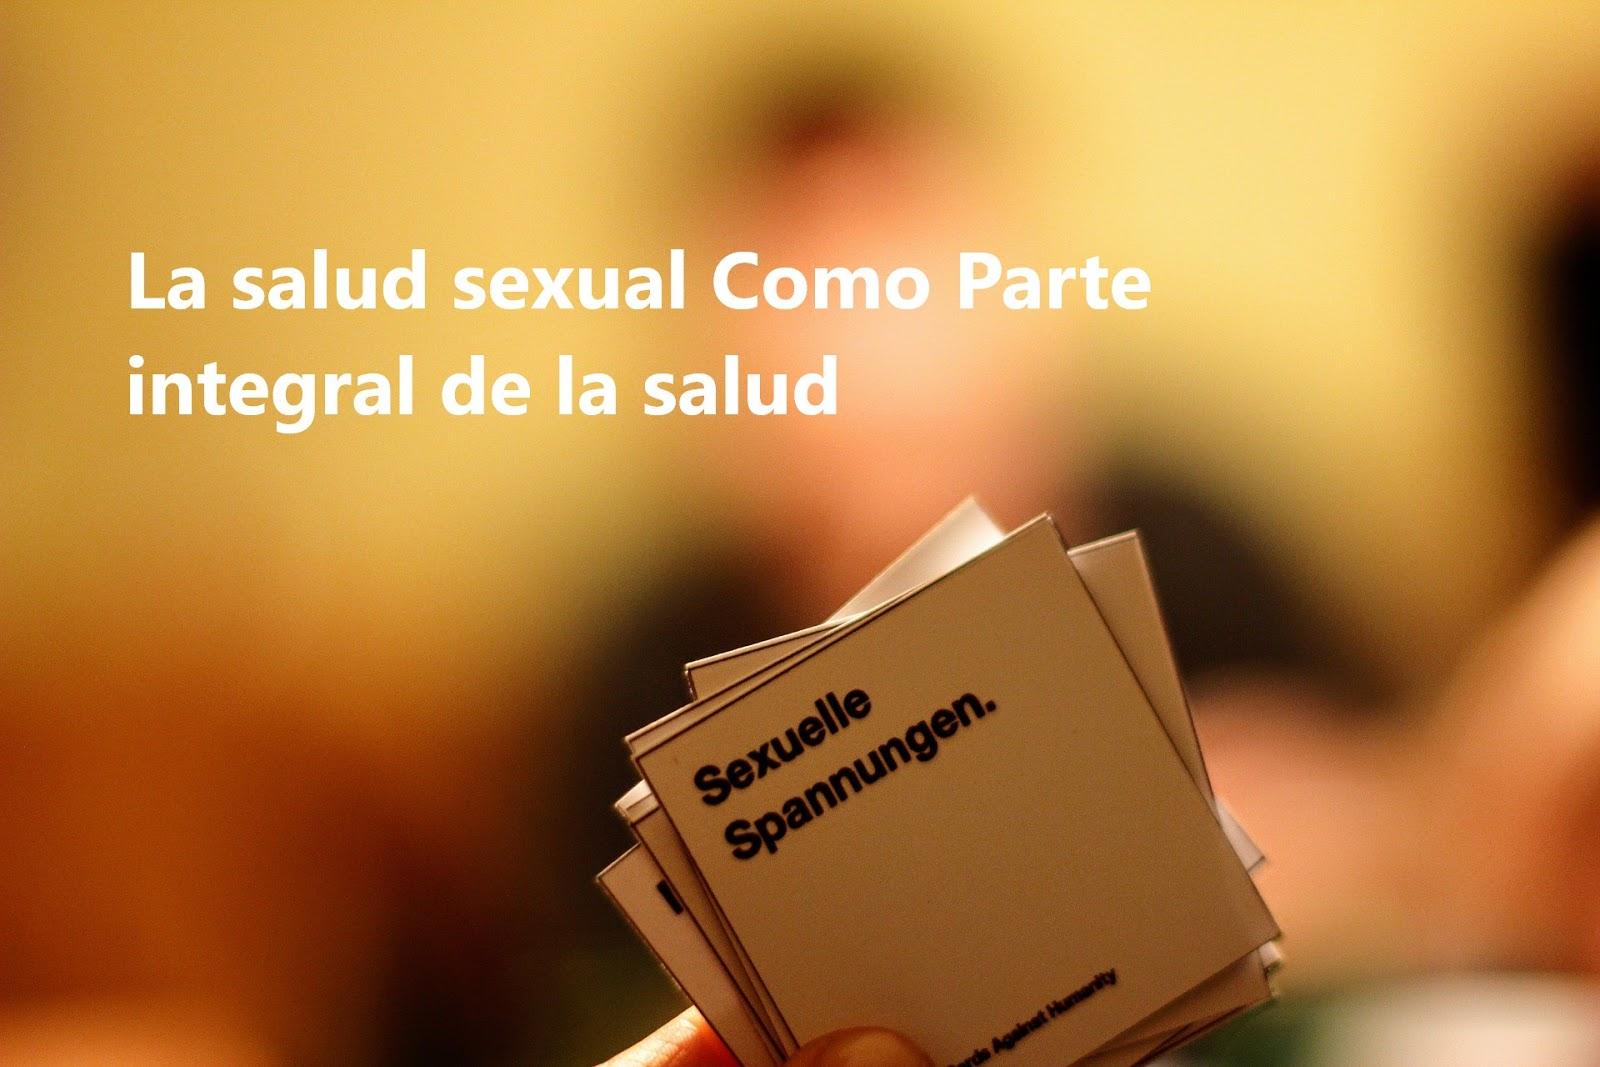 Lo que todo clínico debe saber de Sexología. Libro para descargar gratis